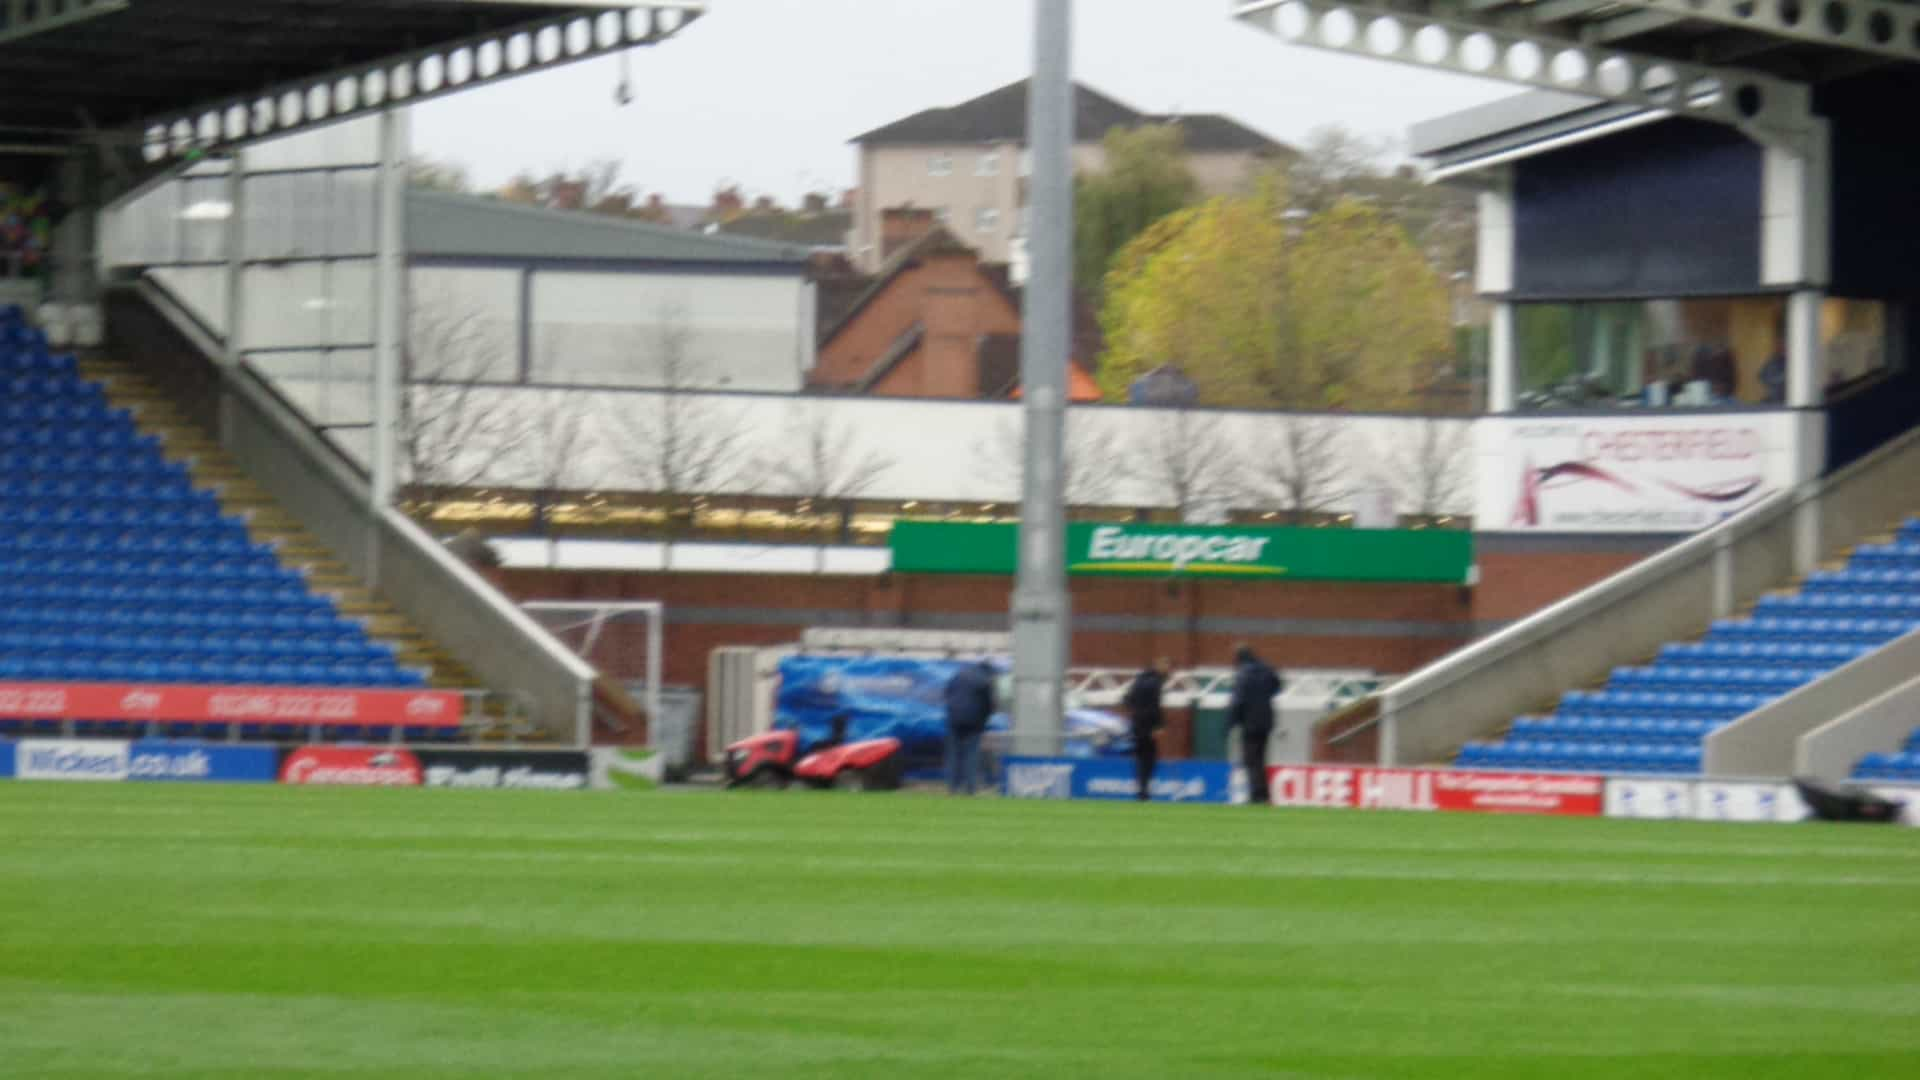 Chesterfield FC Stadium